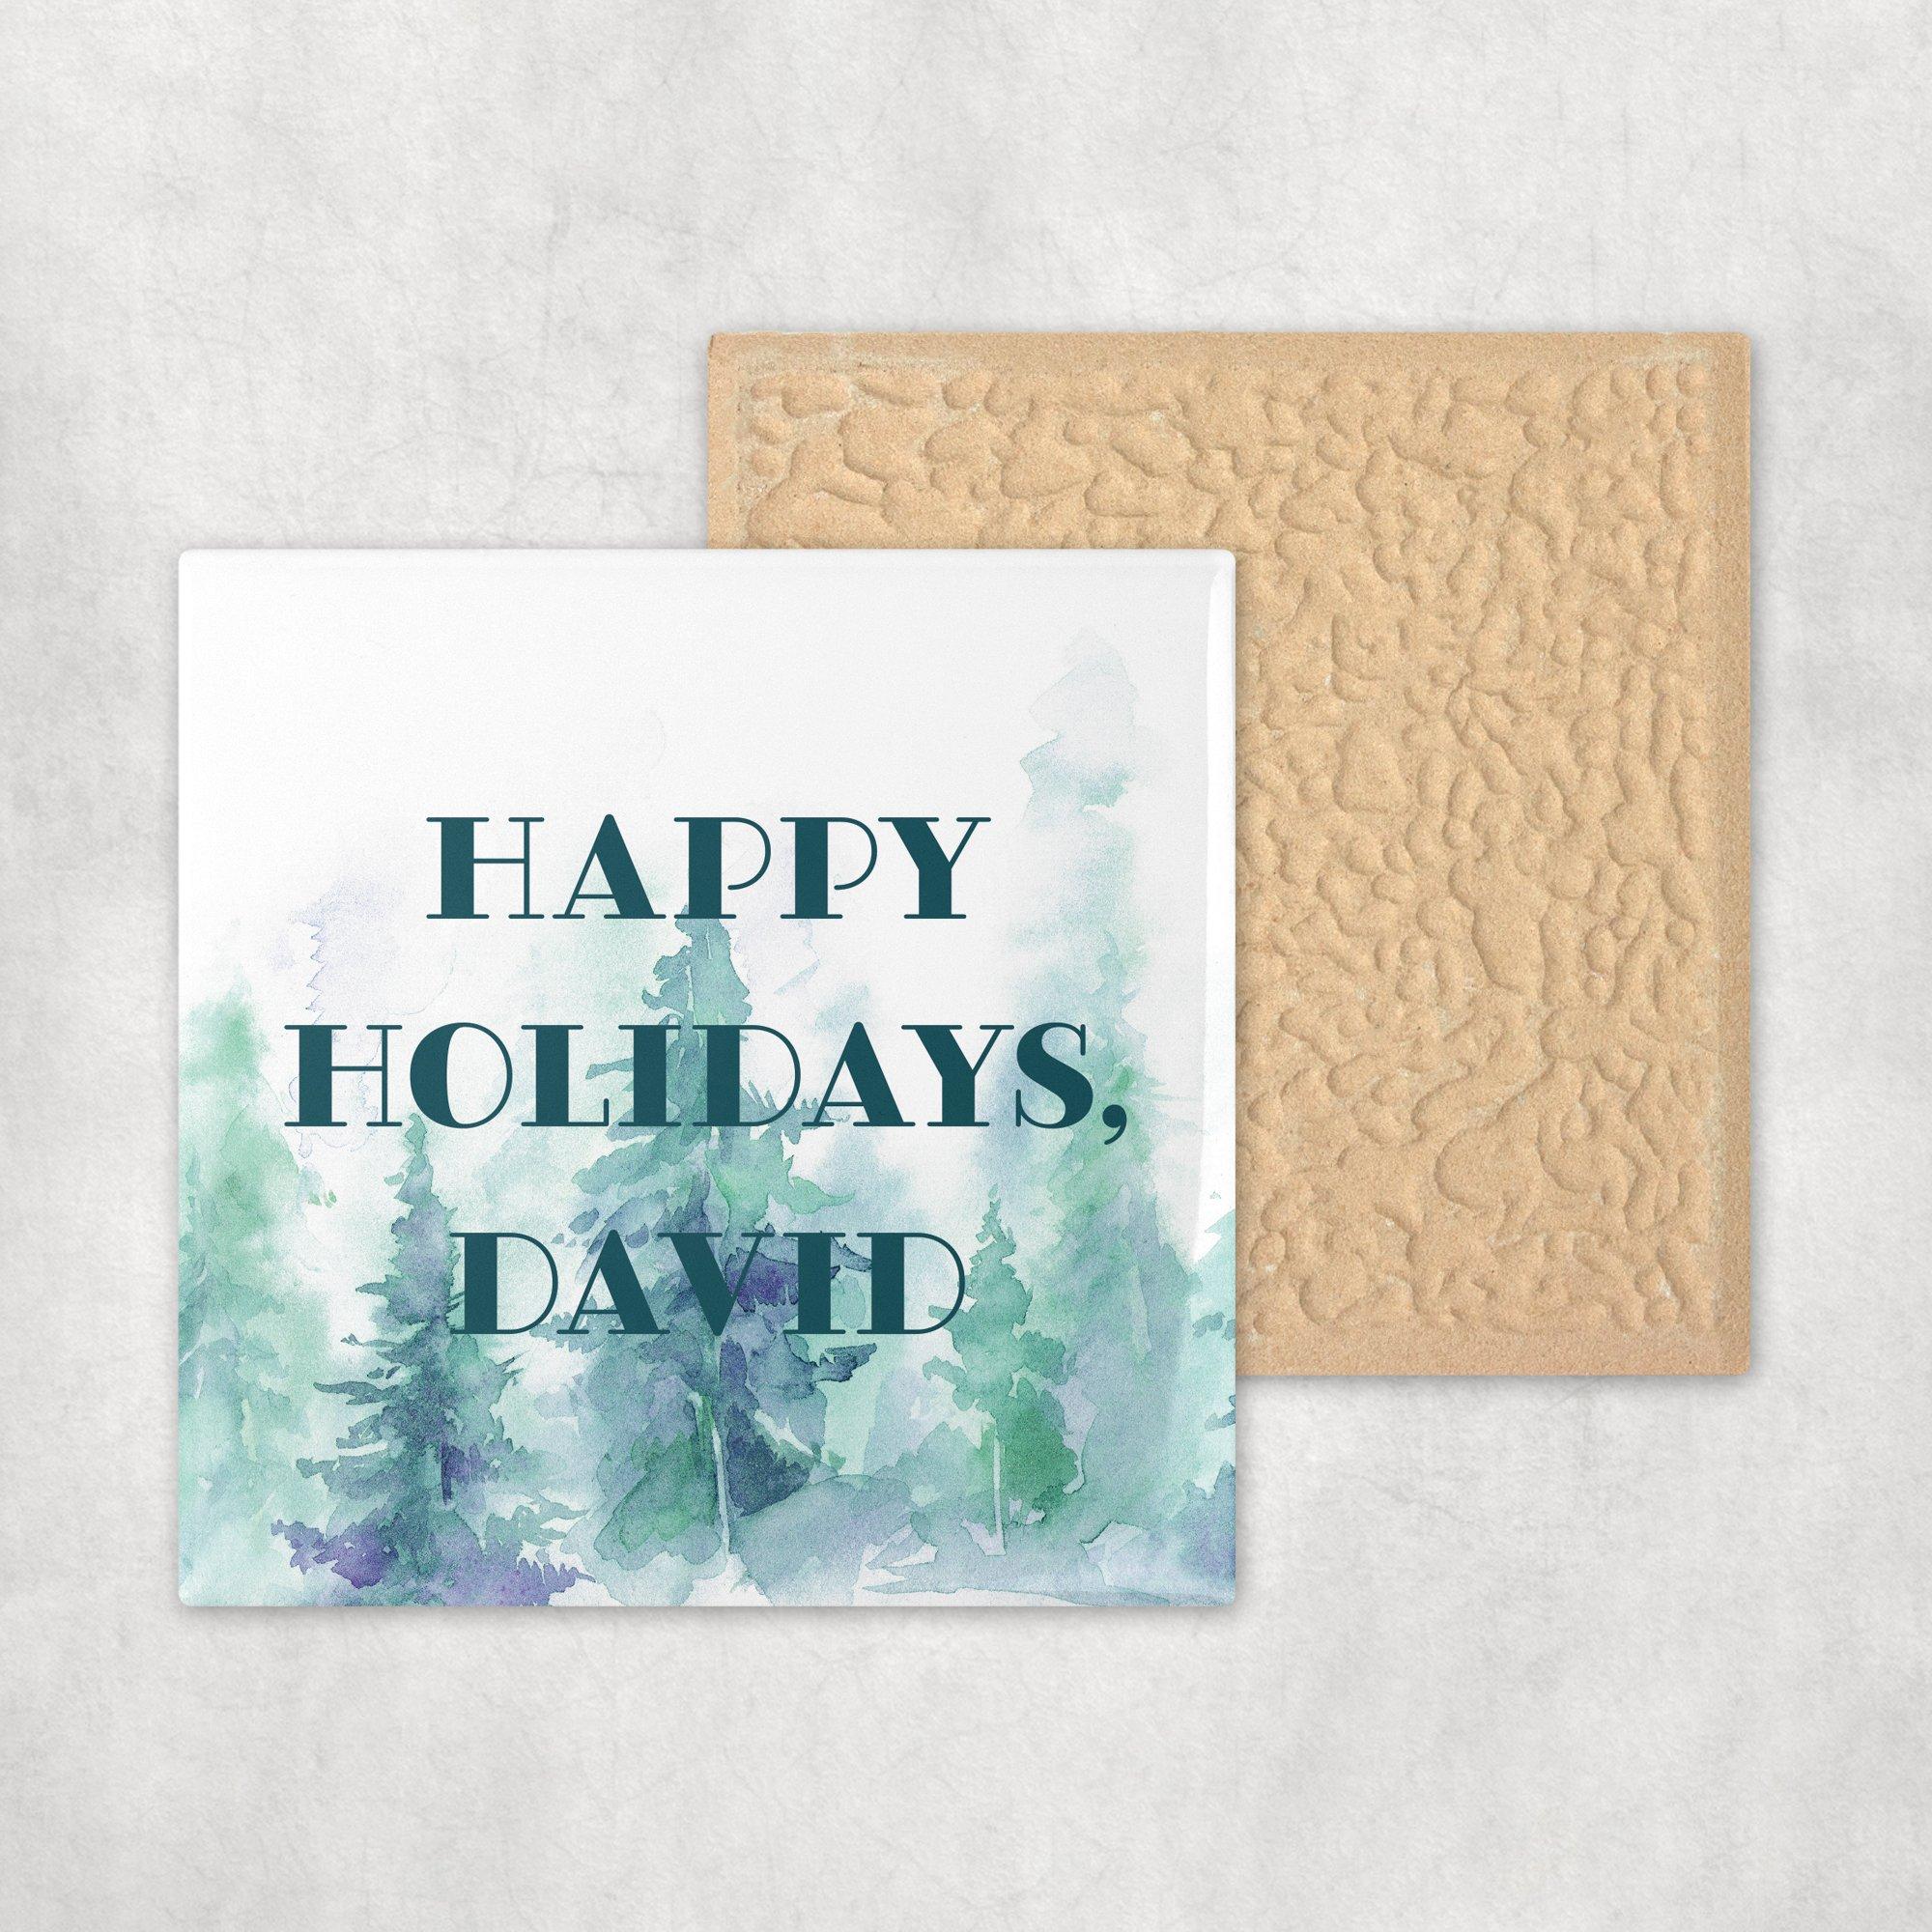 Ceramic Tile Corporate Gift Idea